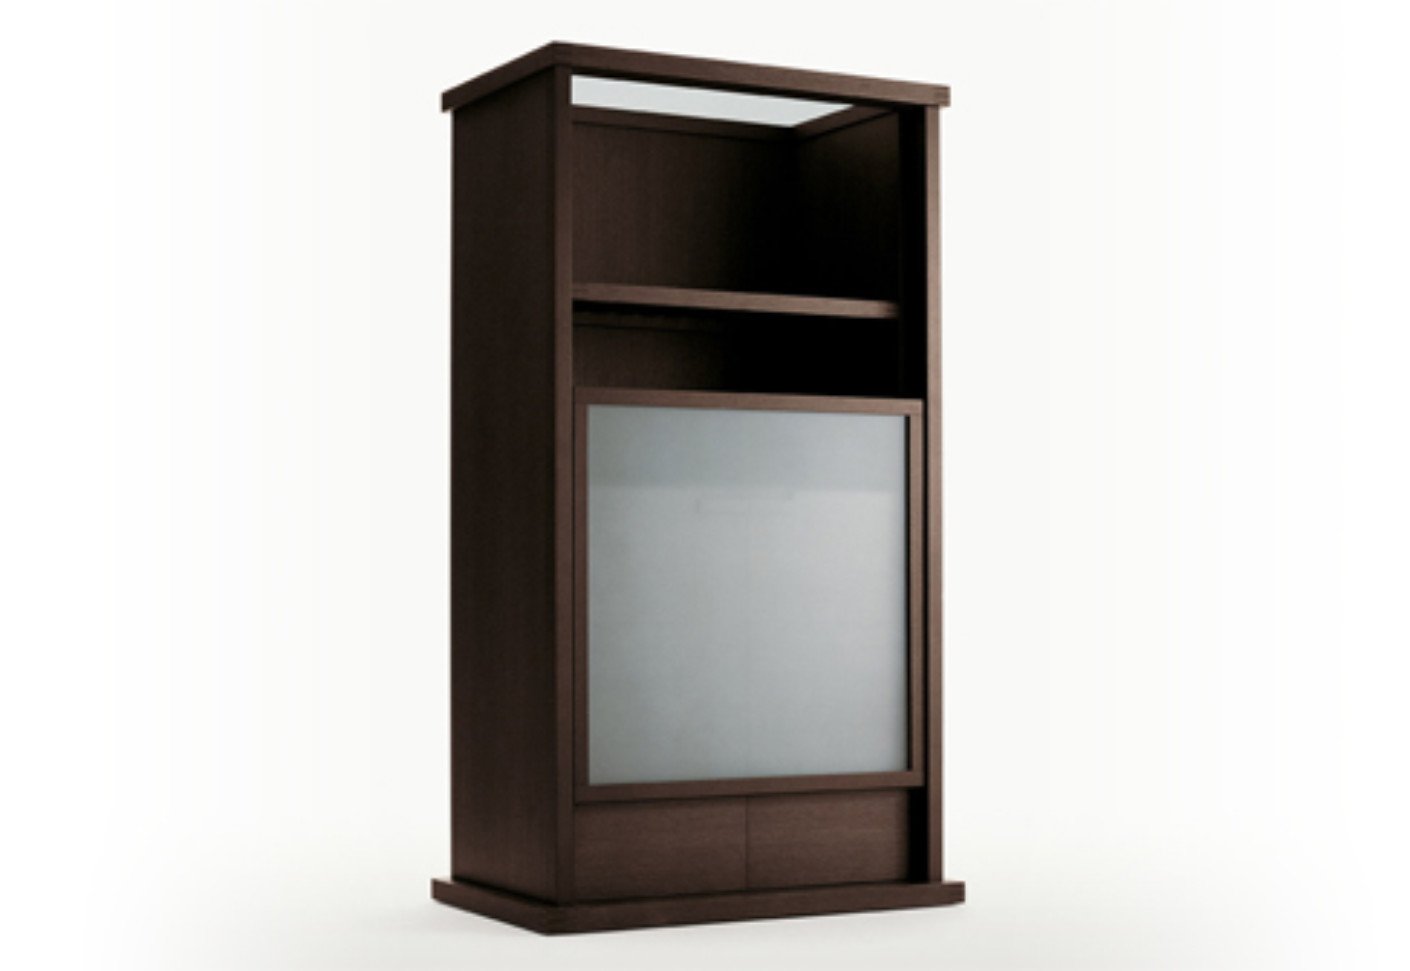 incipit schrank von maxalto stylepark. Black Bedroom Furniture Sets. Home Design Ideas